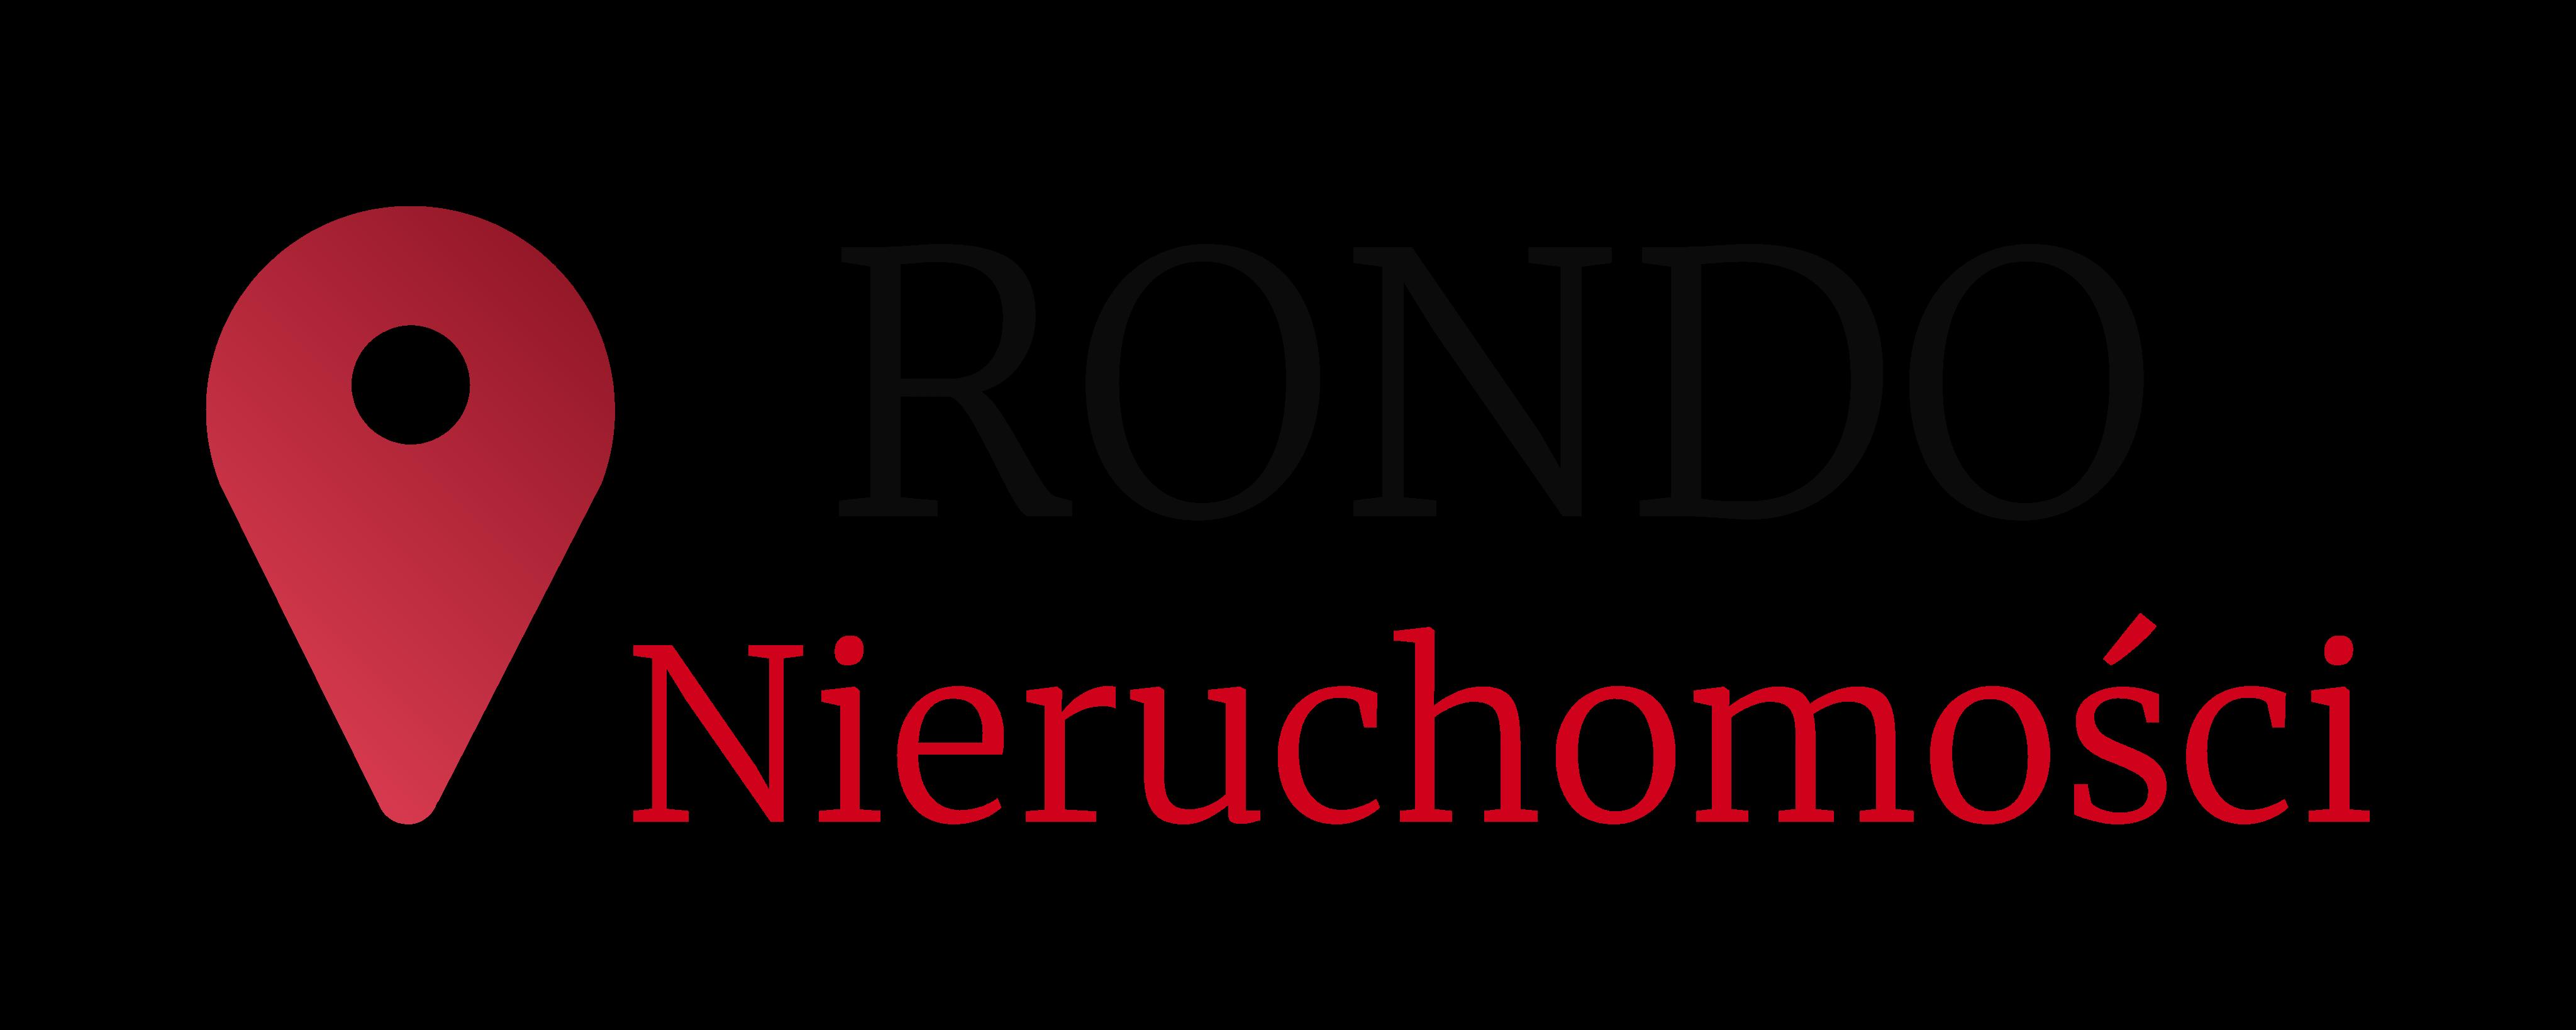 rondo-nieruchomości